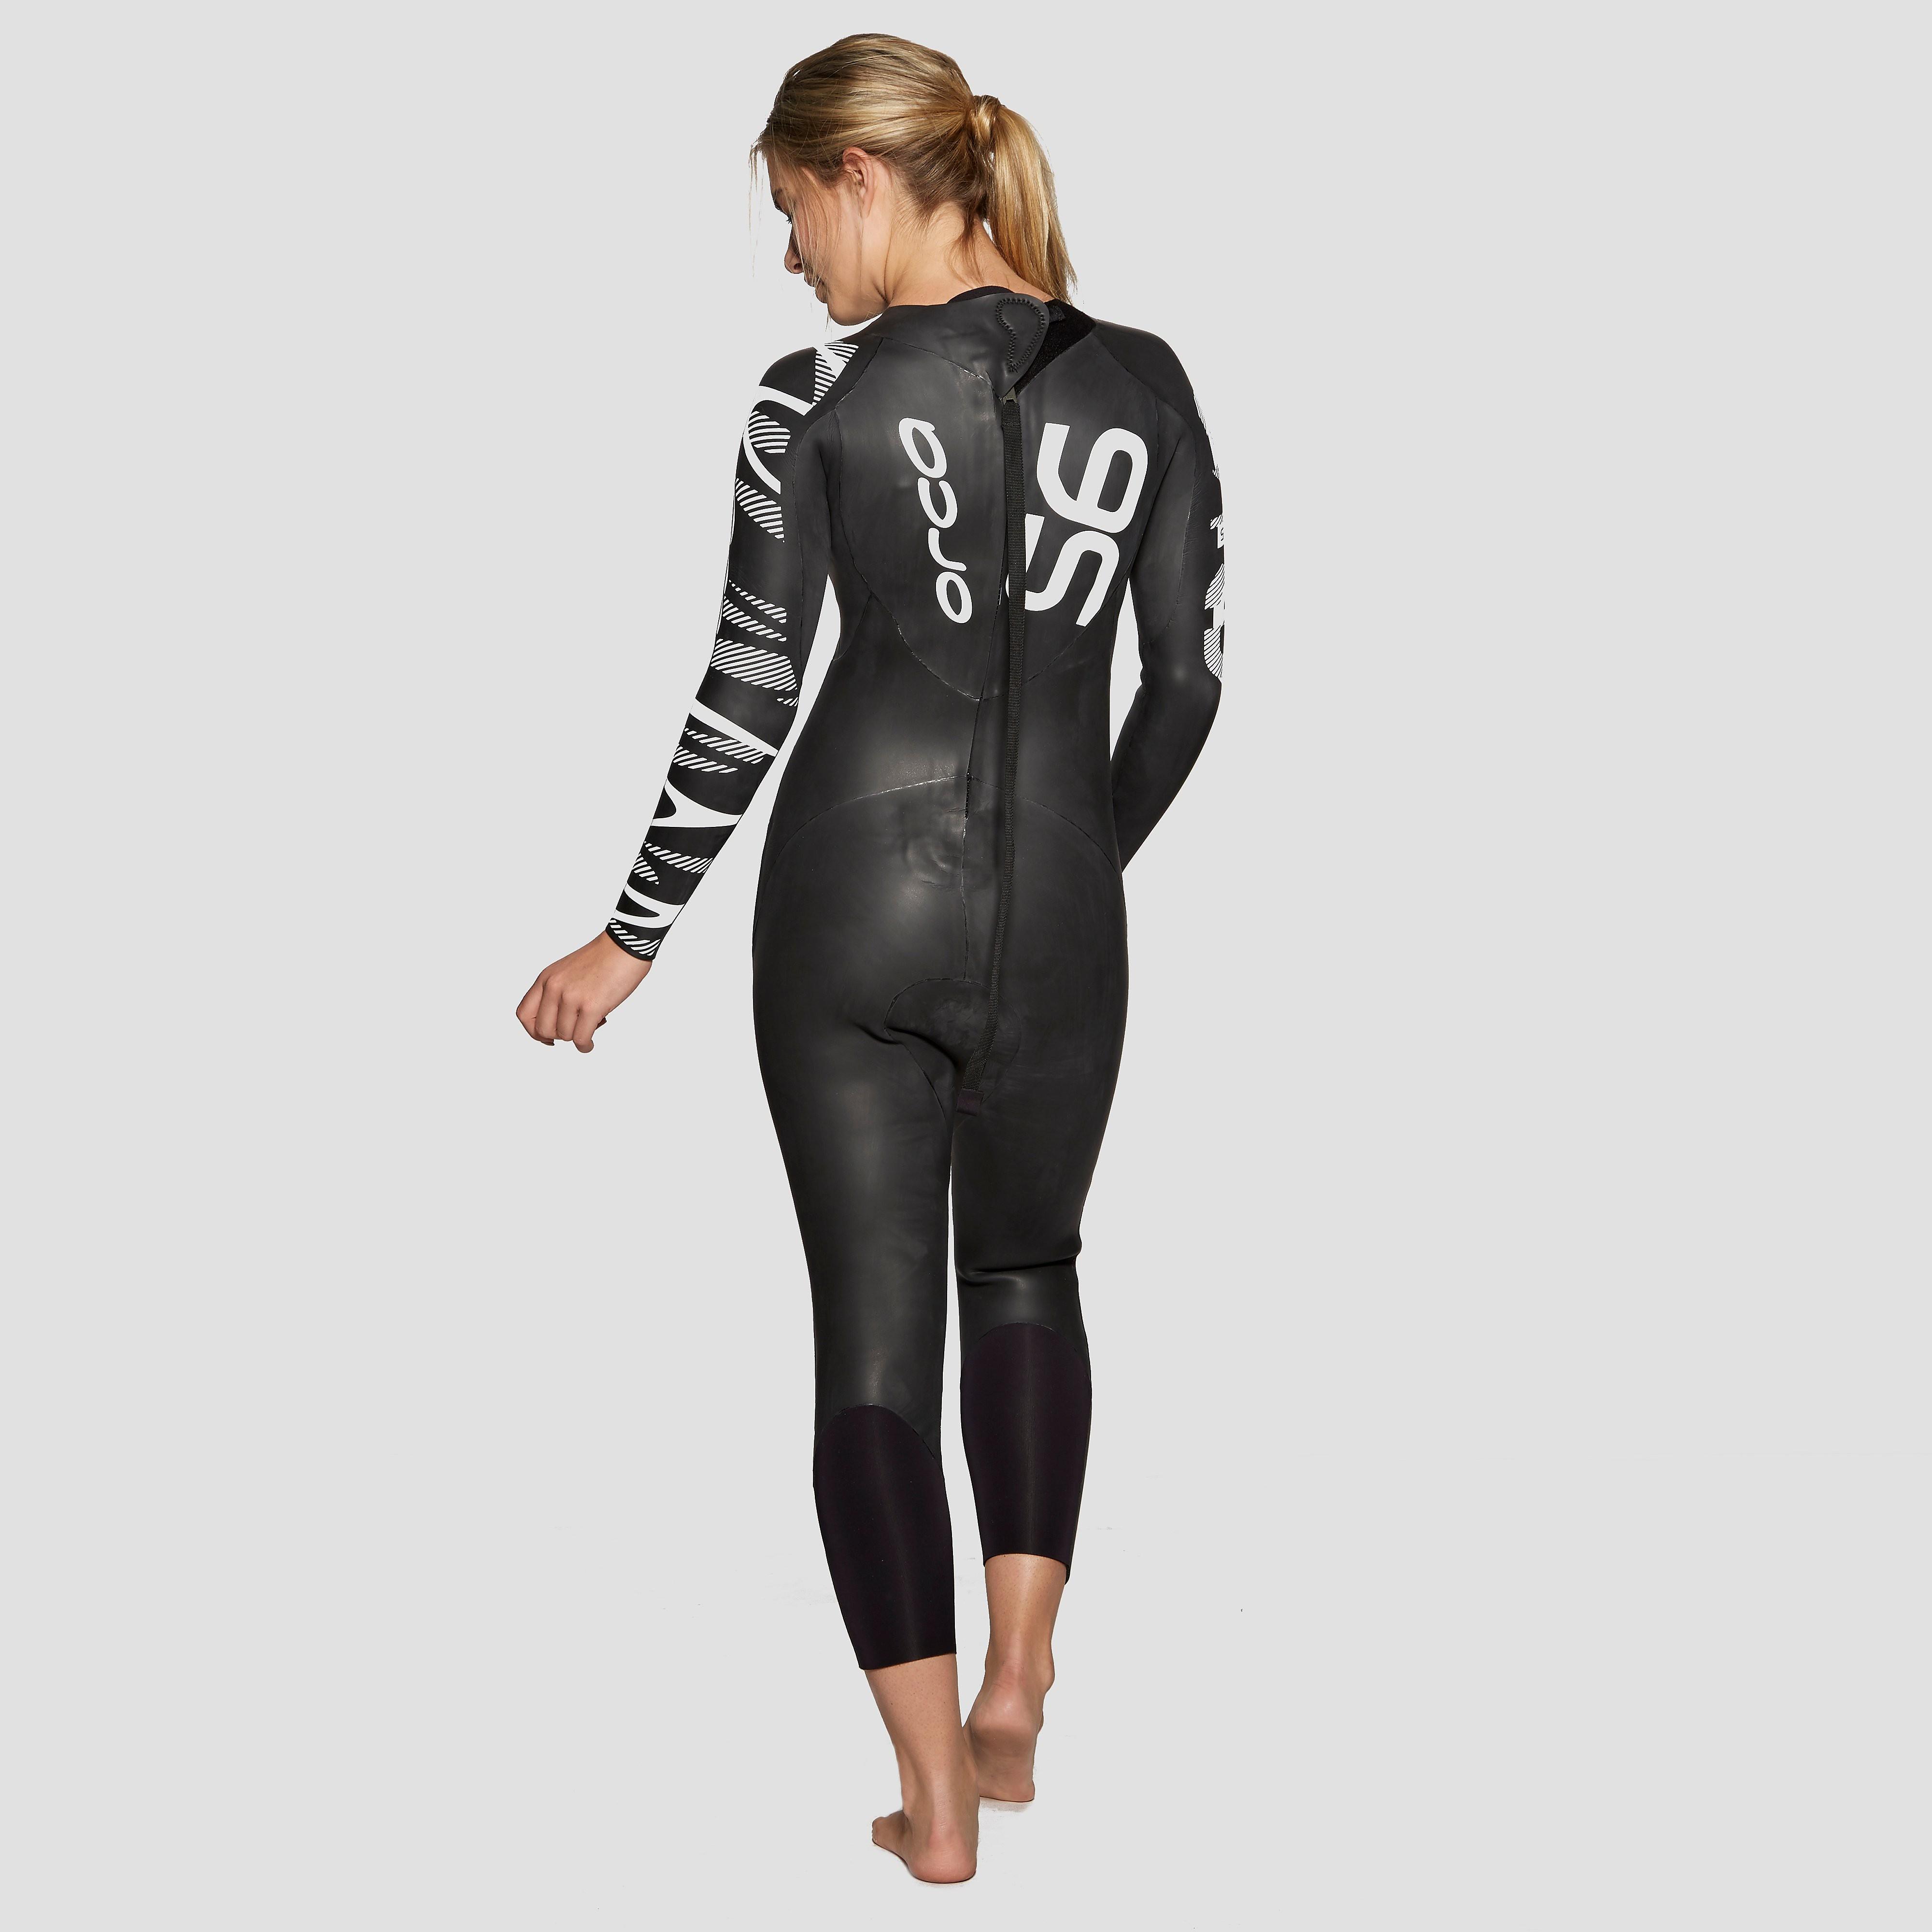 Orca S6 Women's Wetsuit